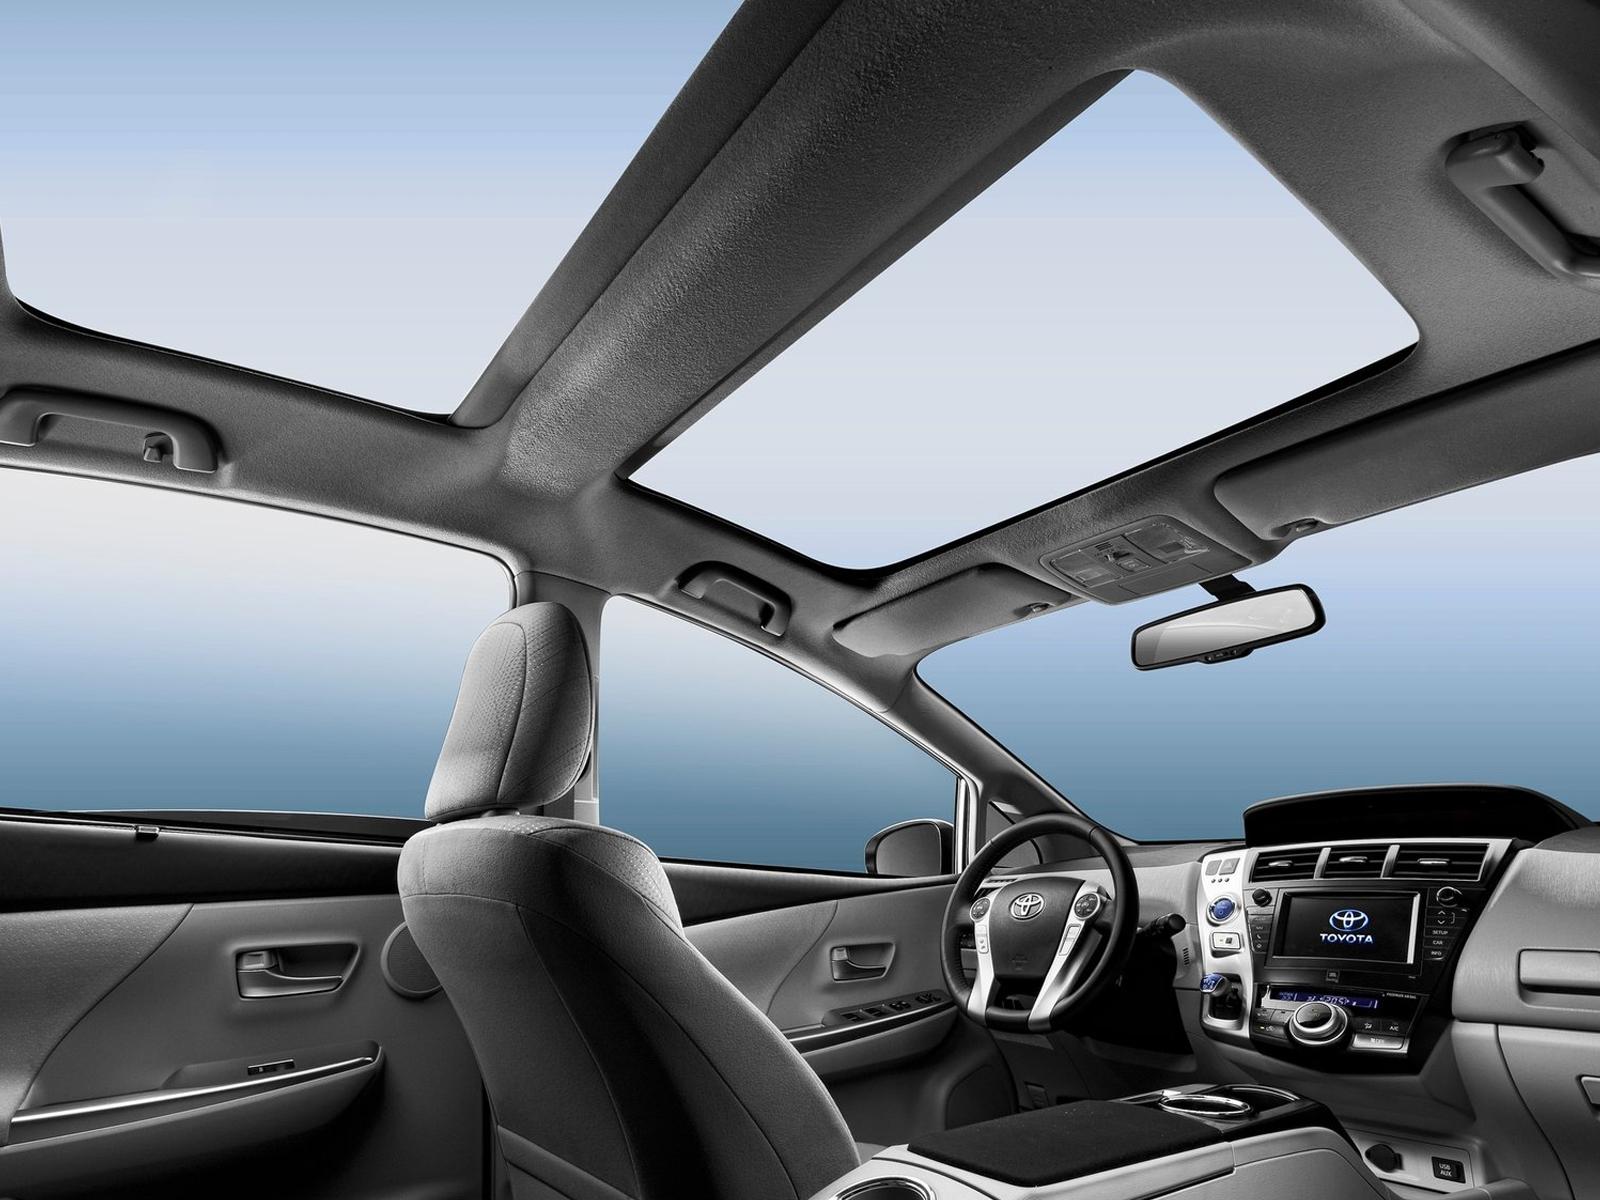 toyota prius wagon hybrid arspiration benzine shortlease. Black Bedroom Furniture Sets. Home Design Ideas